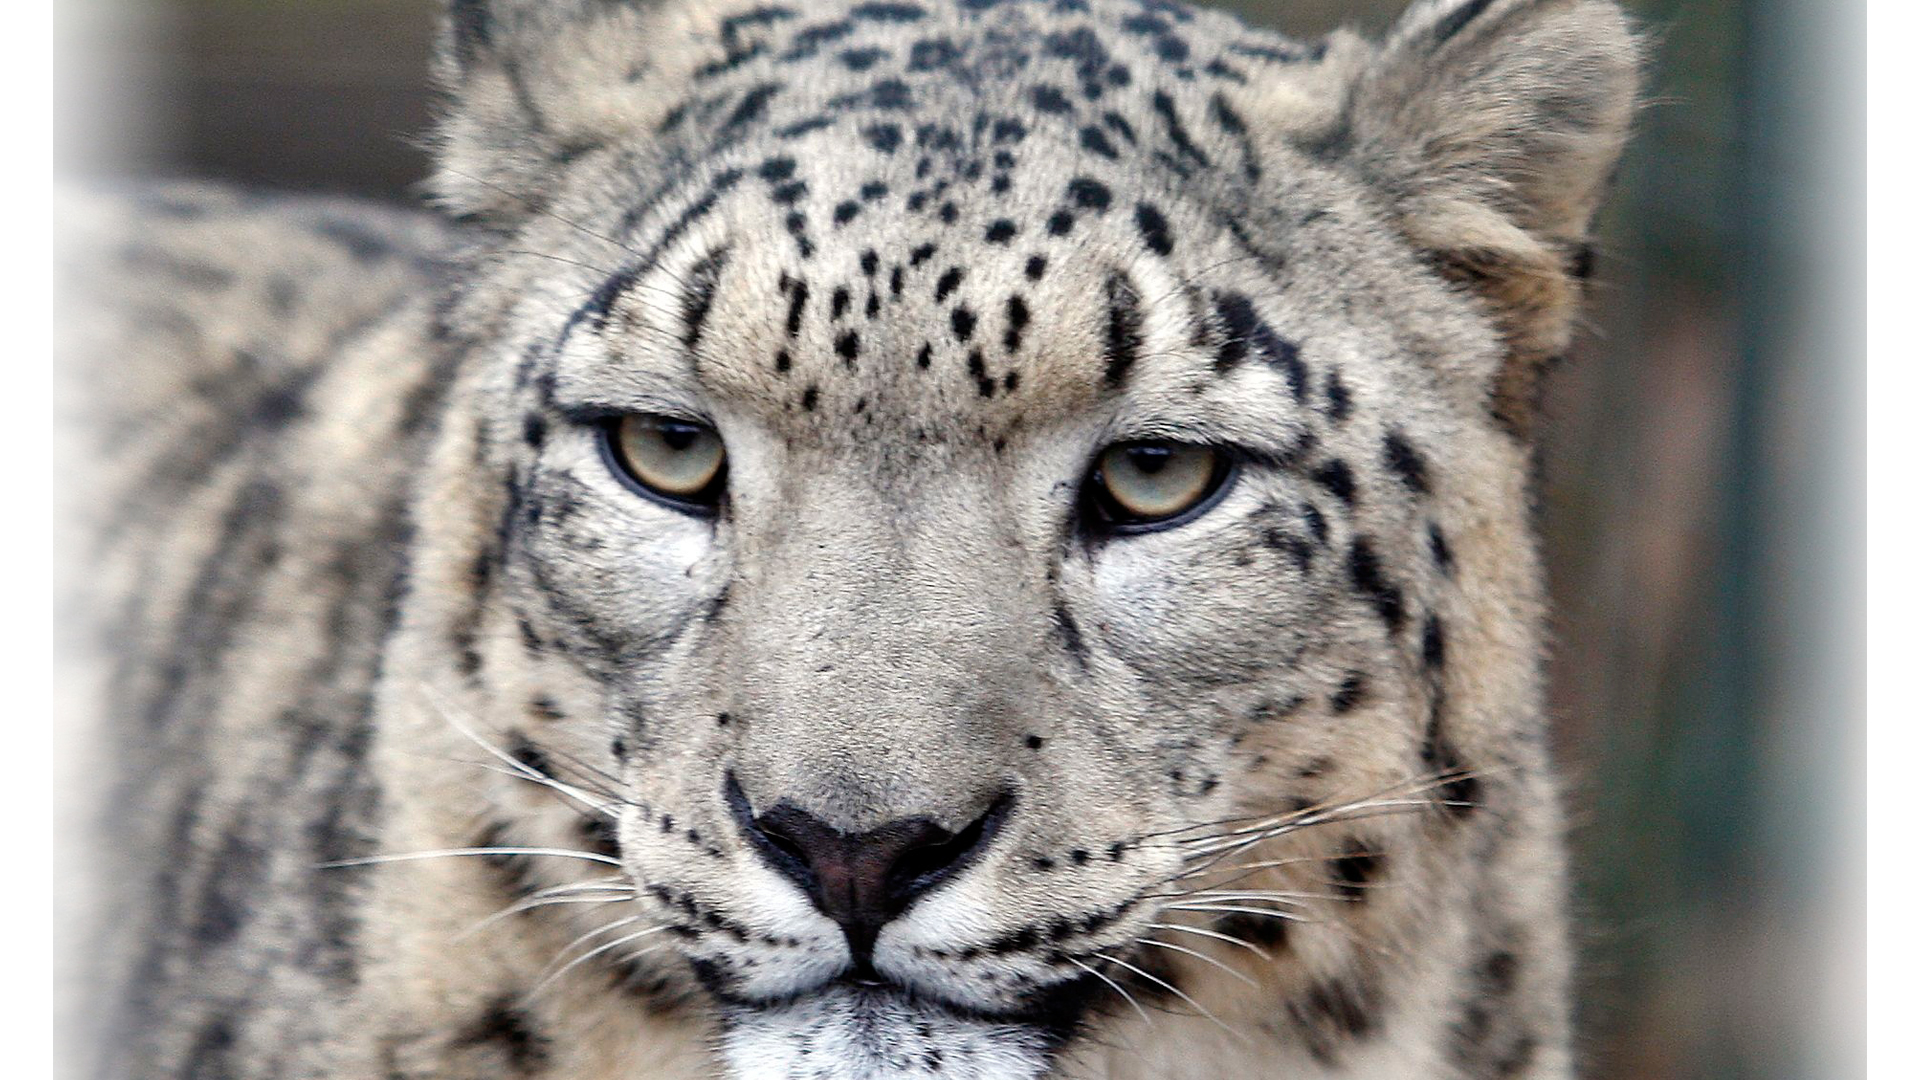 Mantel-Recht-Schneeleopard-Patenschaft-Ladakh